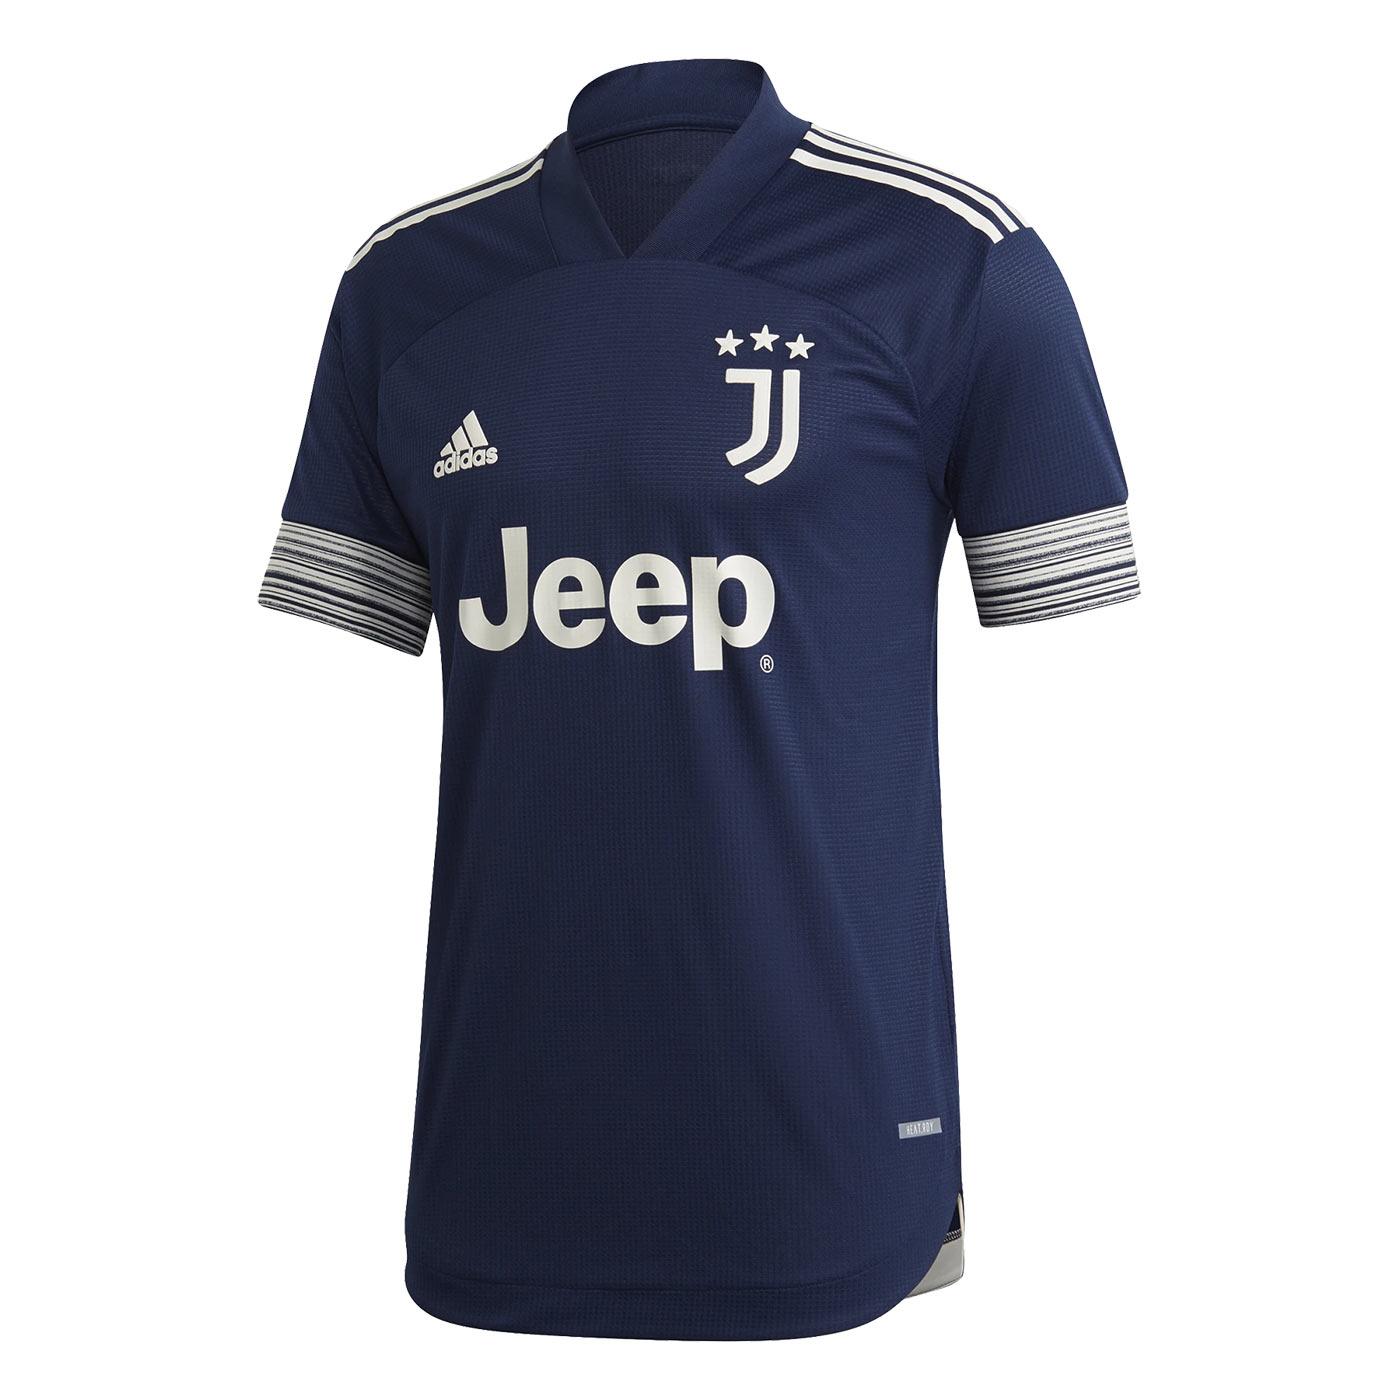 Seconda maglia Juventus 2020-2021, torna il blu di Torino